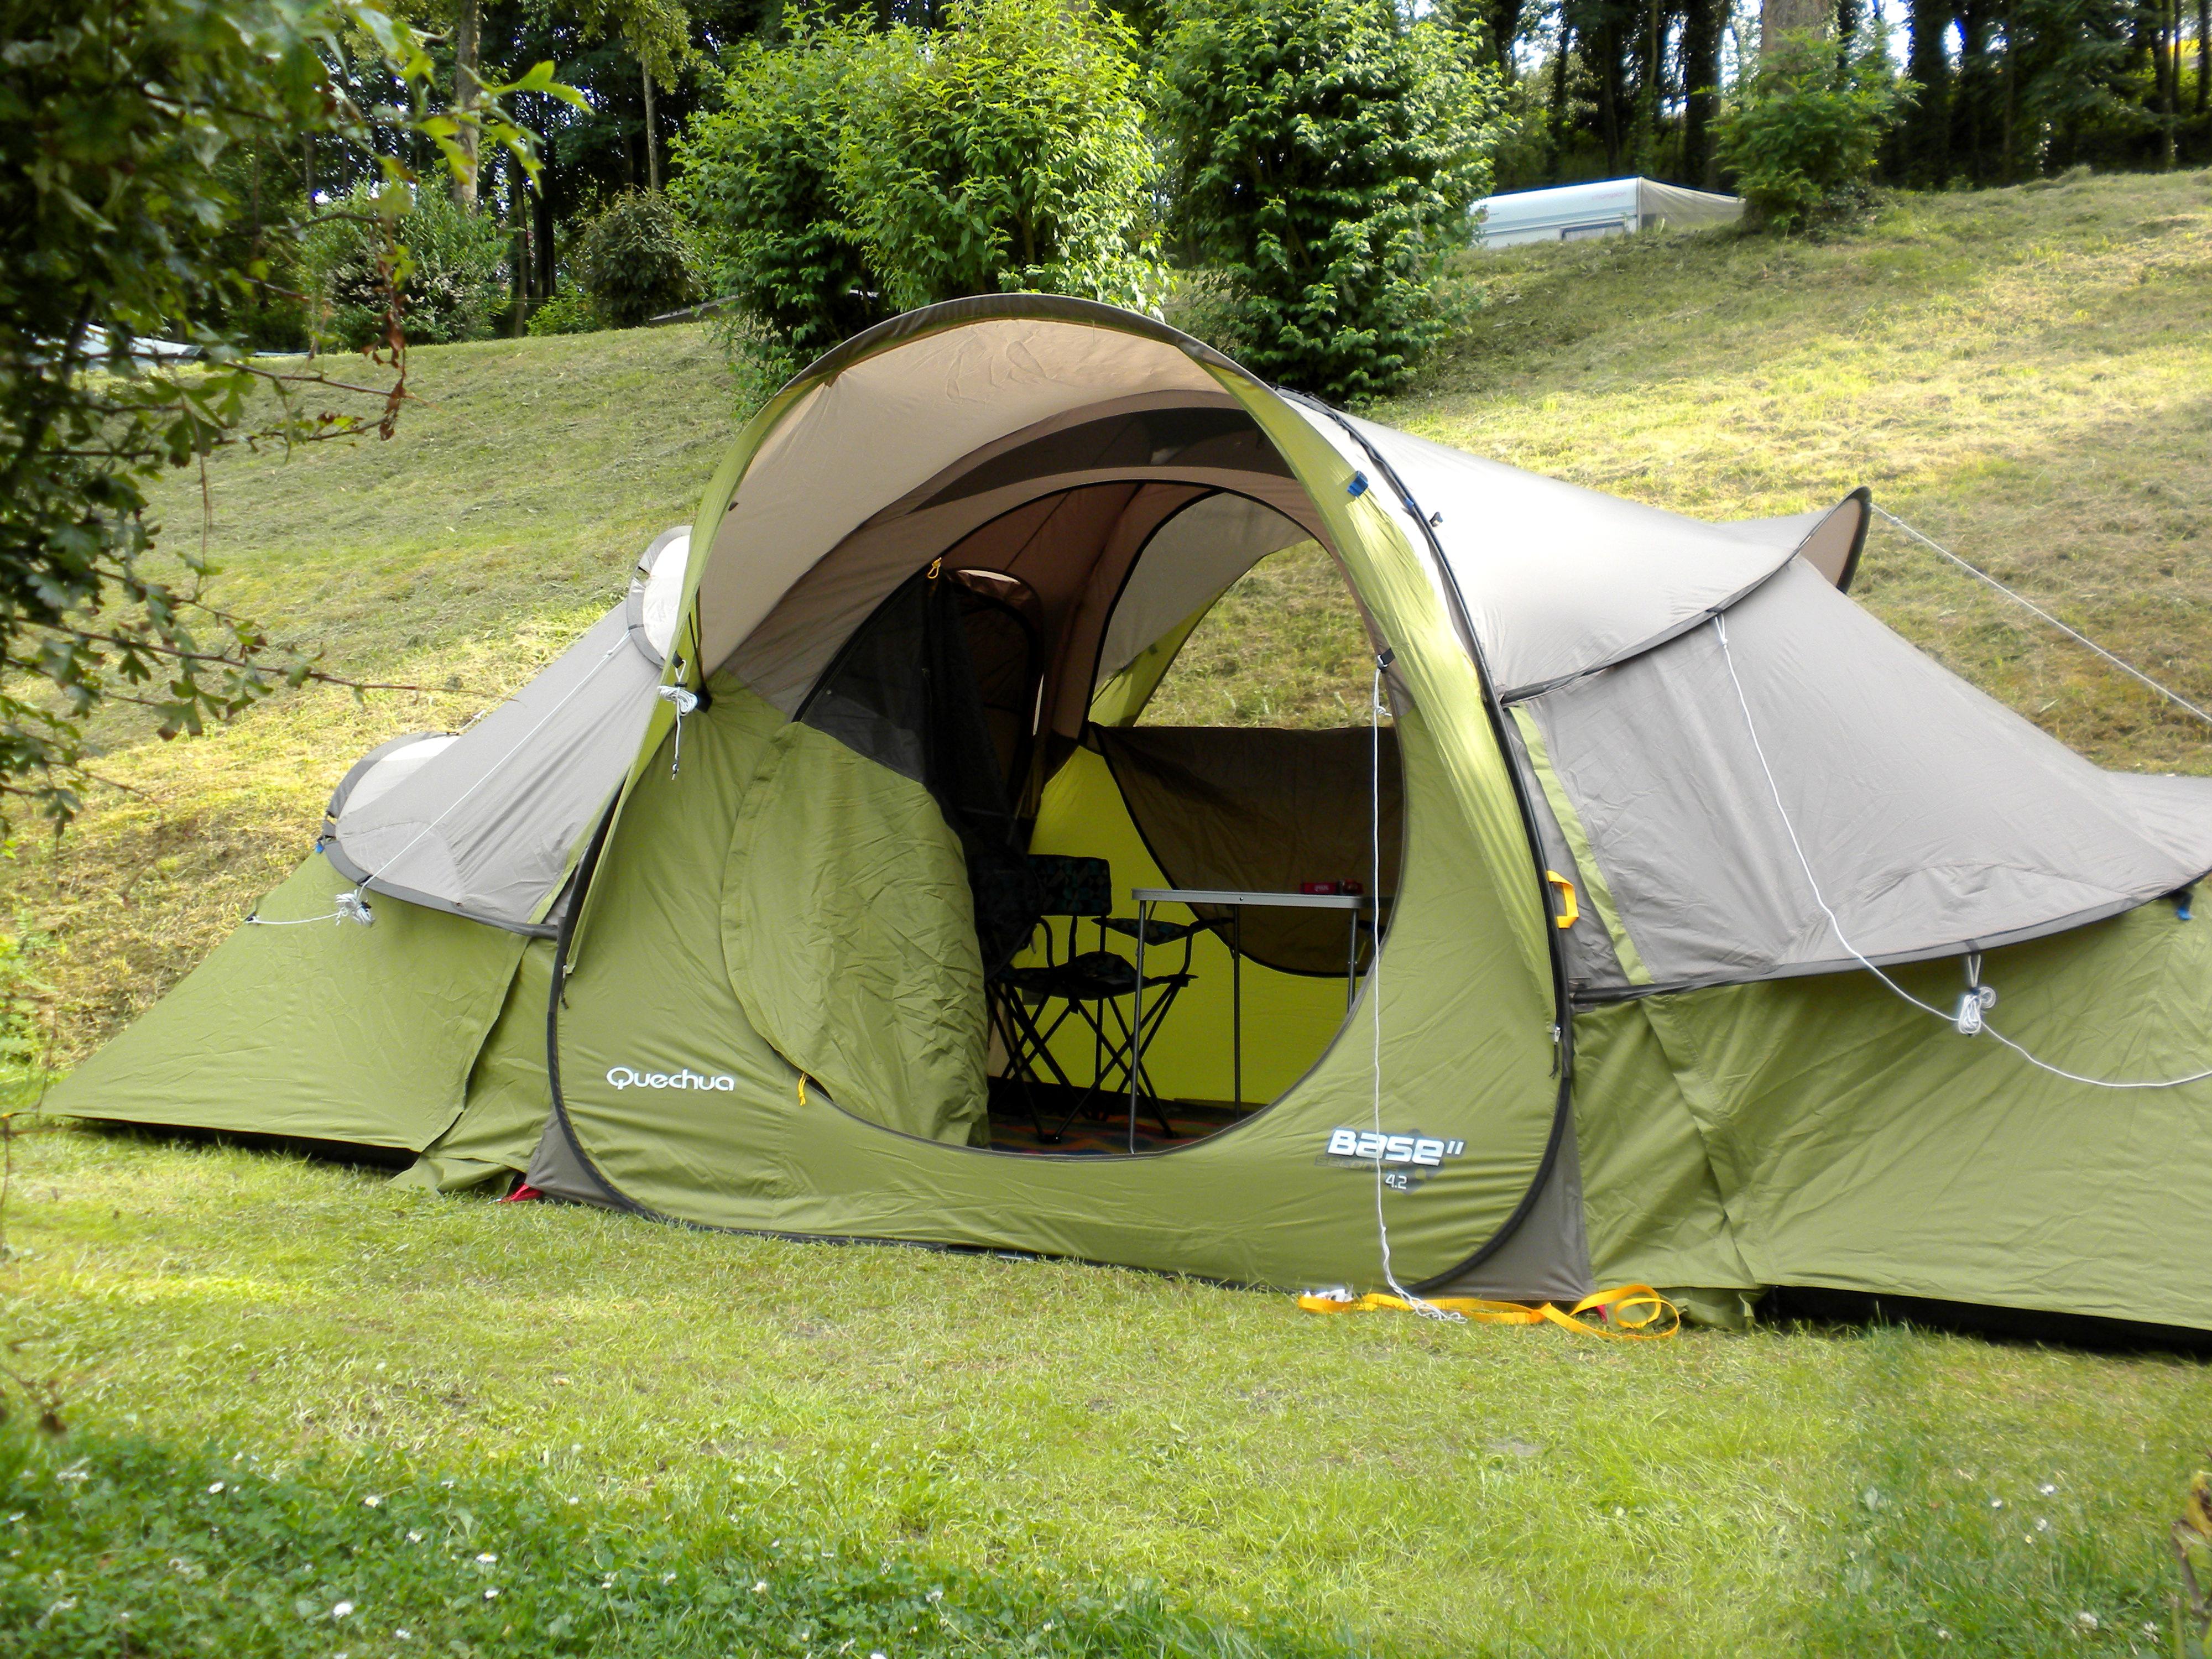 Image & Camping Trip to Europe u2013 Bermuda Rover